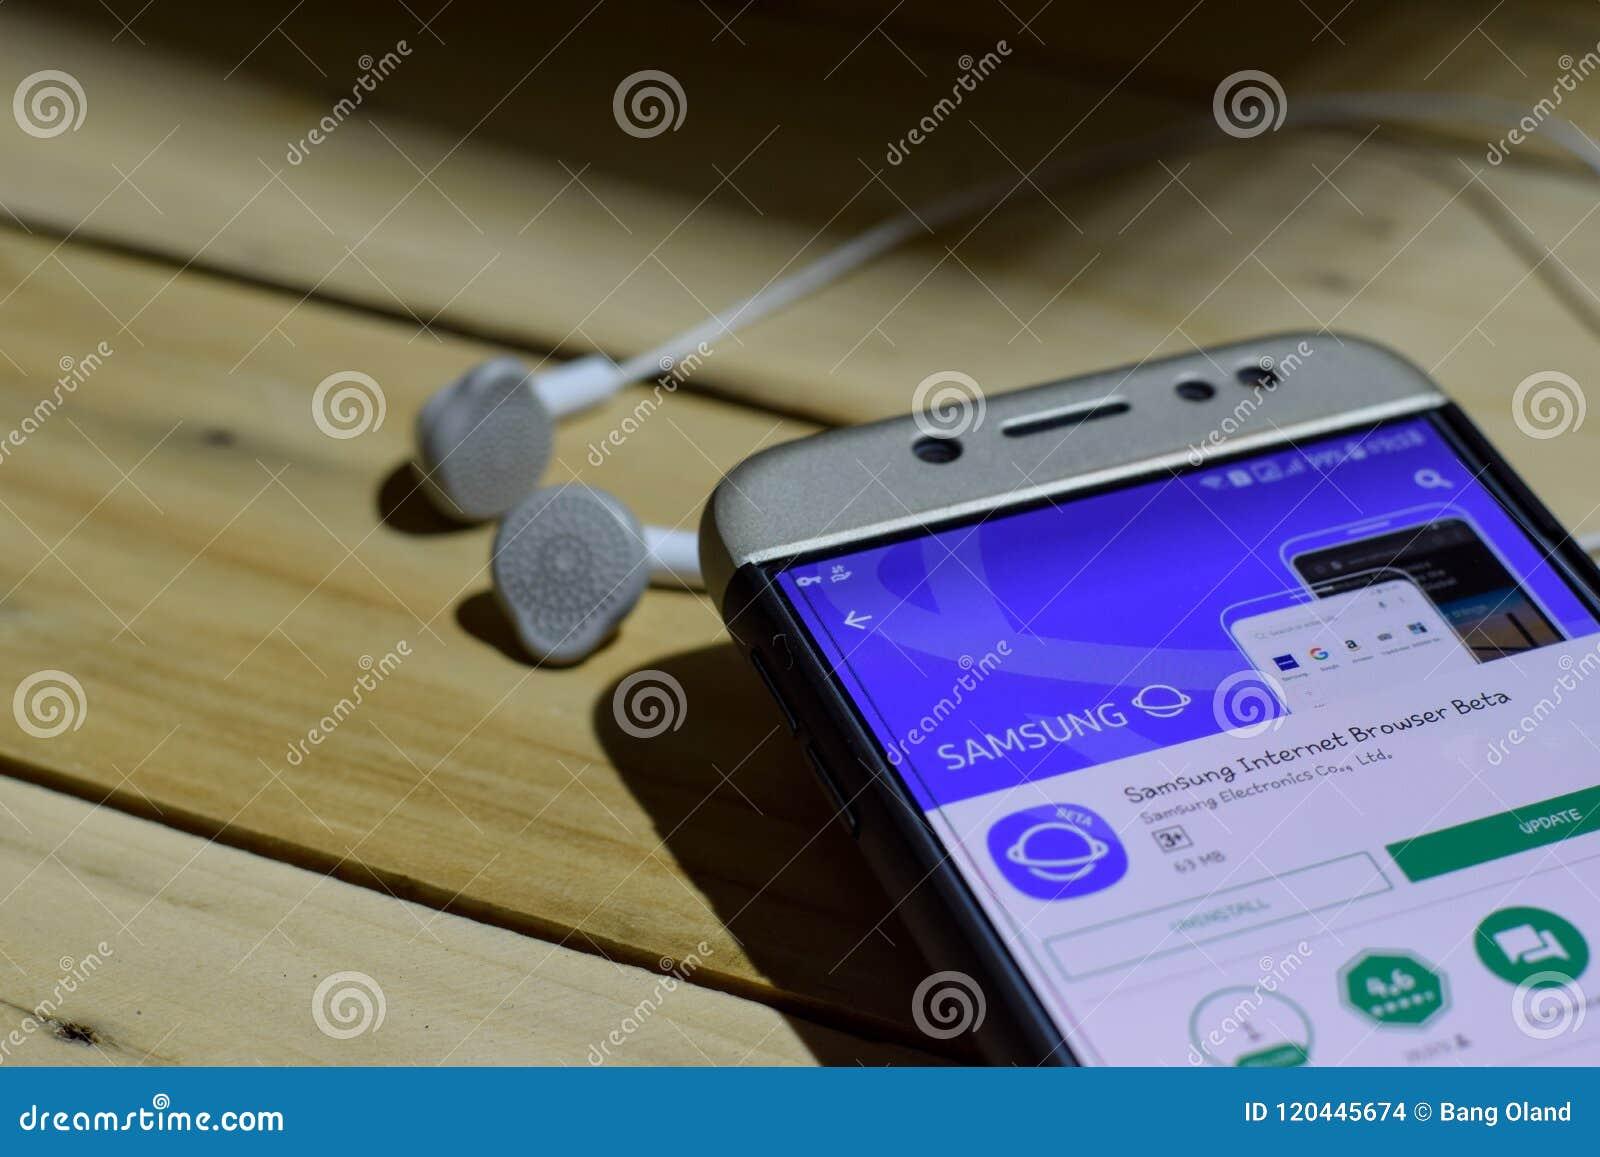 Samsung Dev Application On Smartphone Screen  Internet